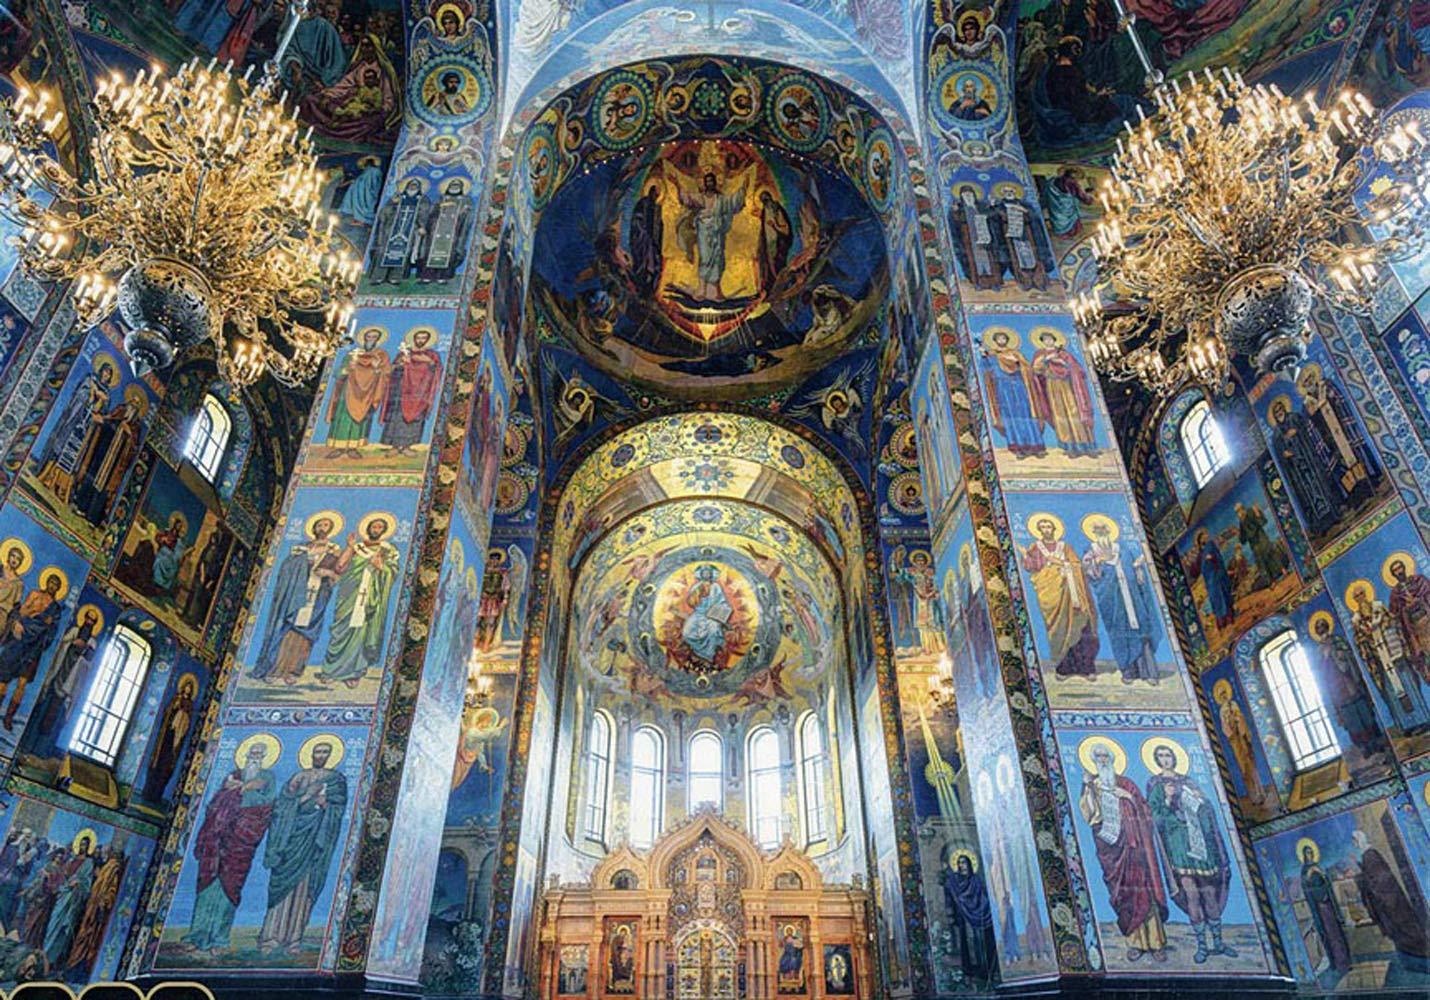 50%OFF The - Paper 1000ピース ジグソーパズル - カトリック教会(LA1000-041) - 20 20 x x 29インチ & 51 x 74cm B07GPZ92LC, 矢板市:817947c7 --- a0267596.xsph.ru